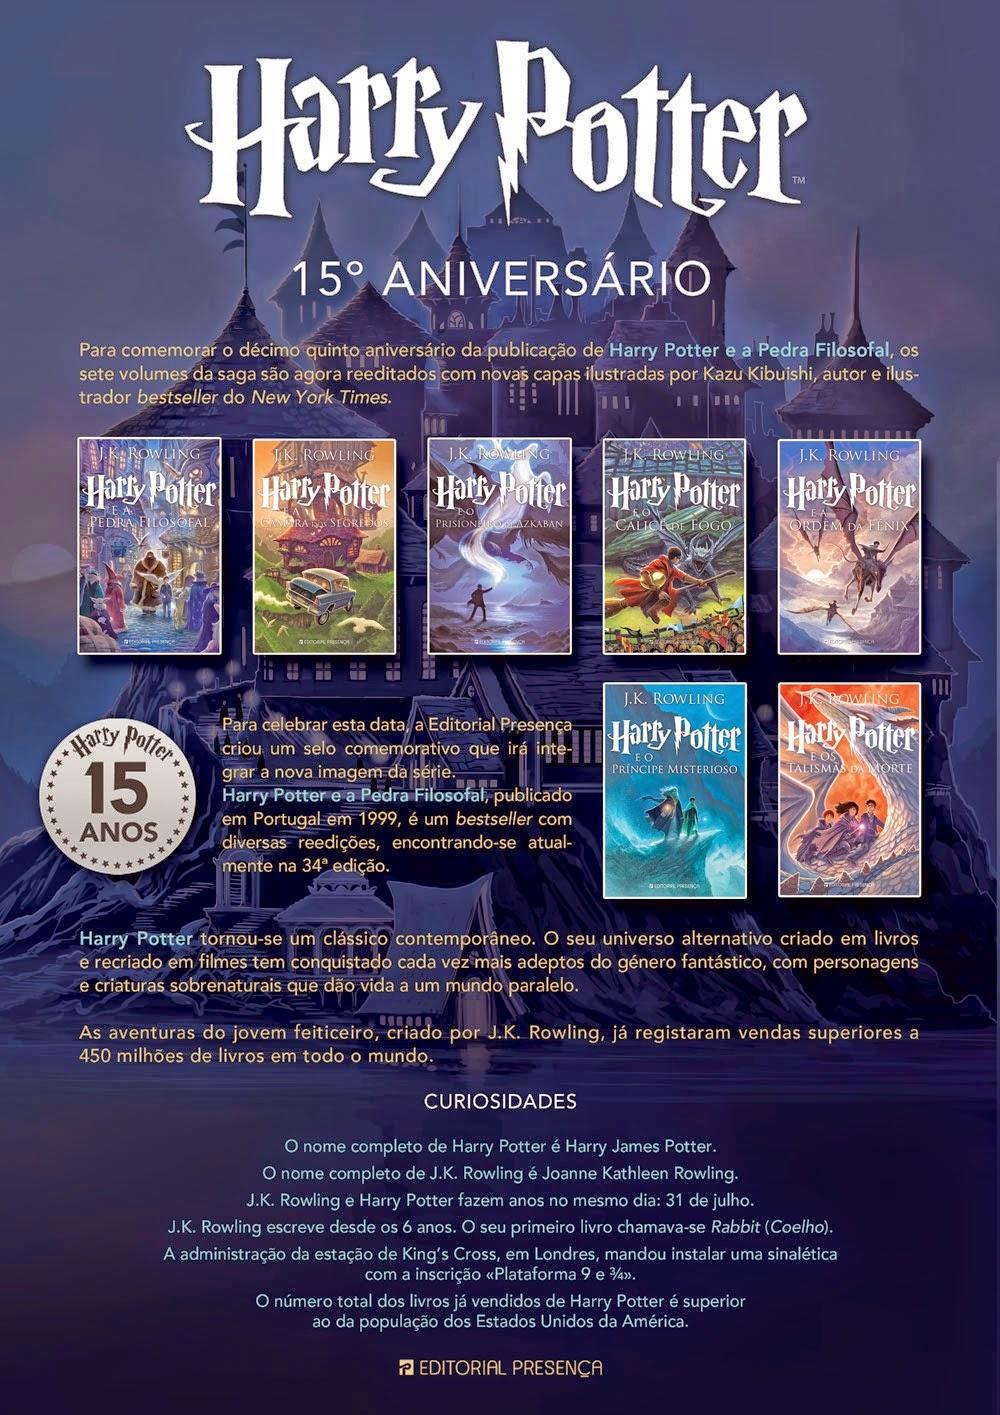 15 Aniversário Harry Potter, Kazu Kibuishi